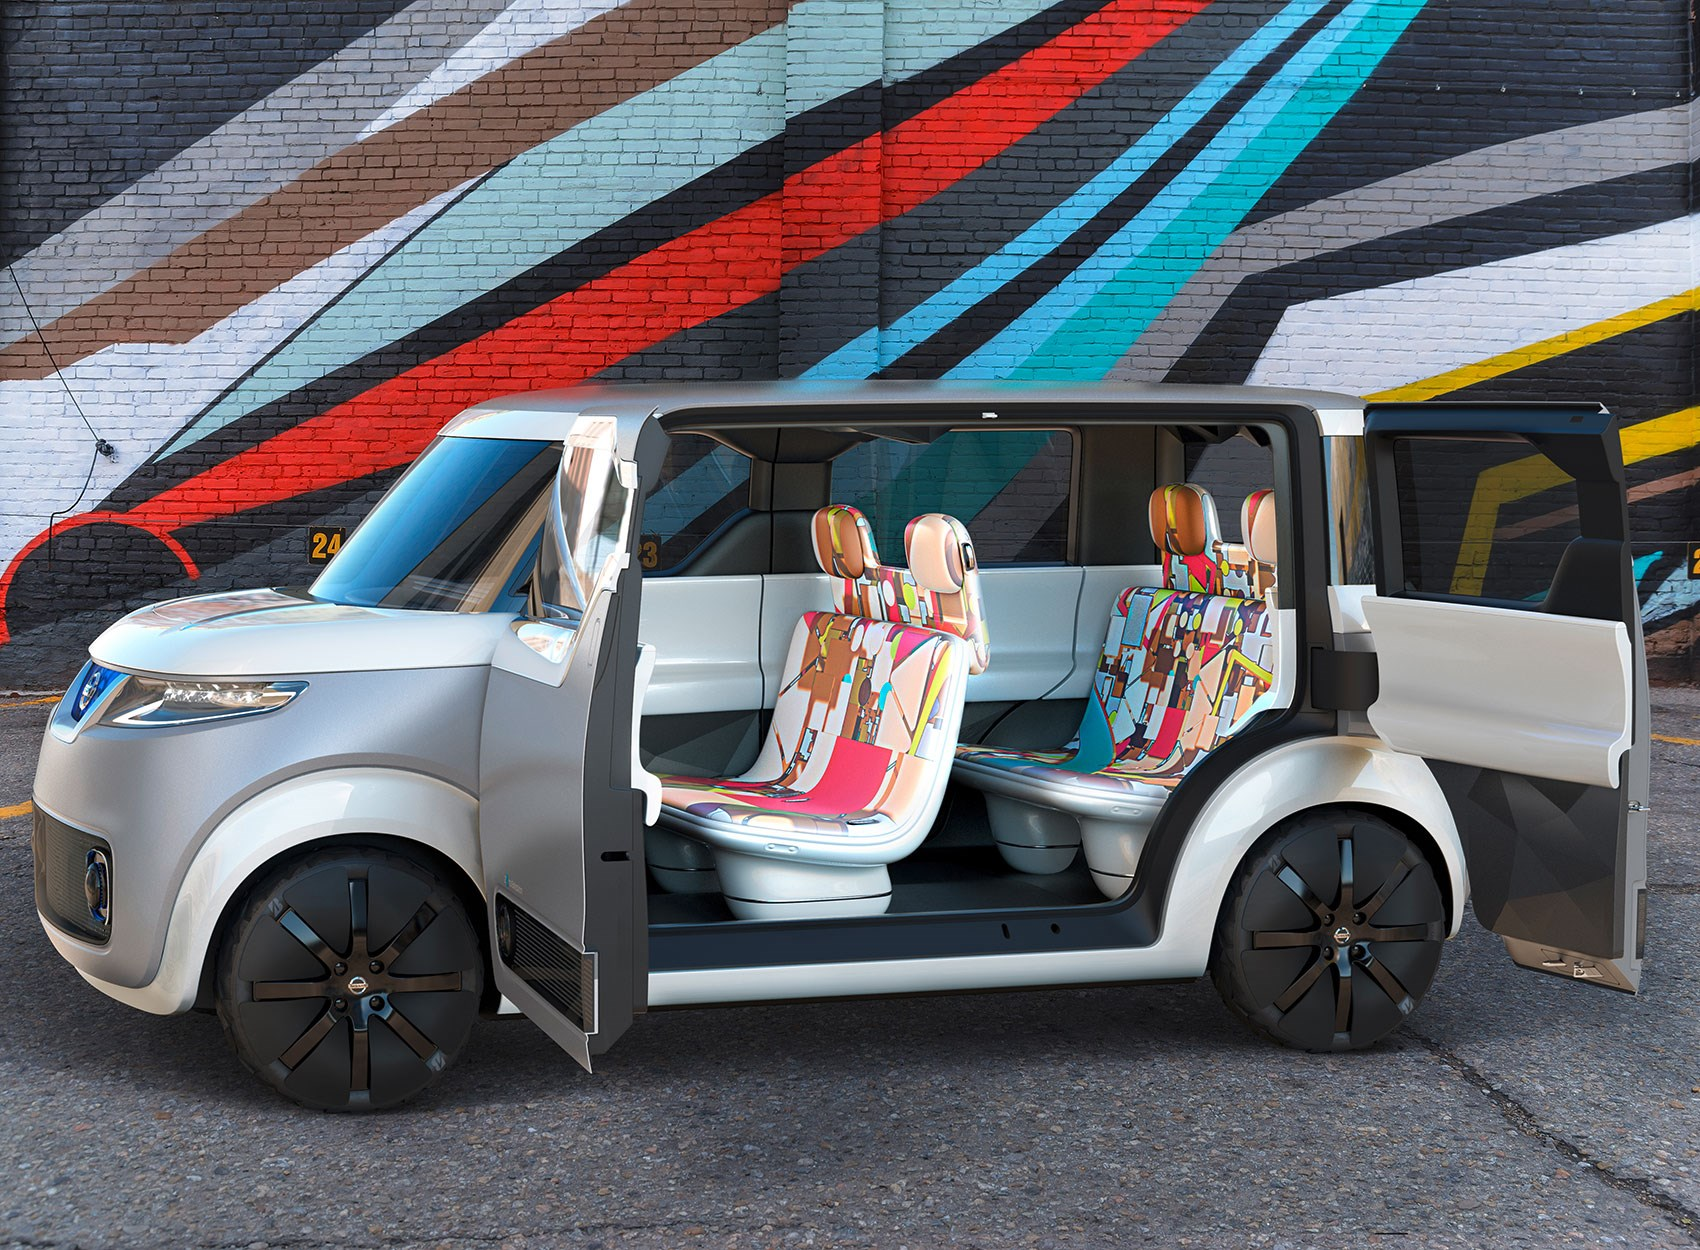 Nissan teatro for dayz concept 2015 targets digital natives by car magazine - Car design show ...